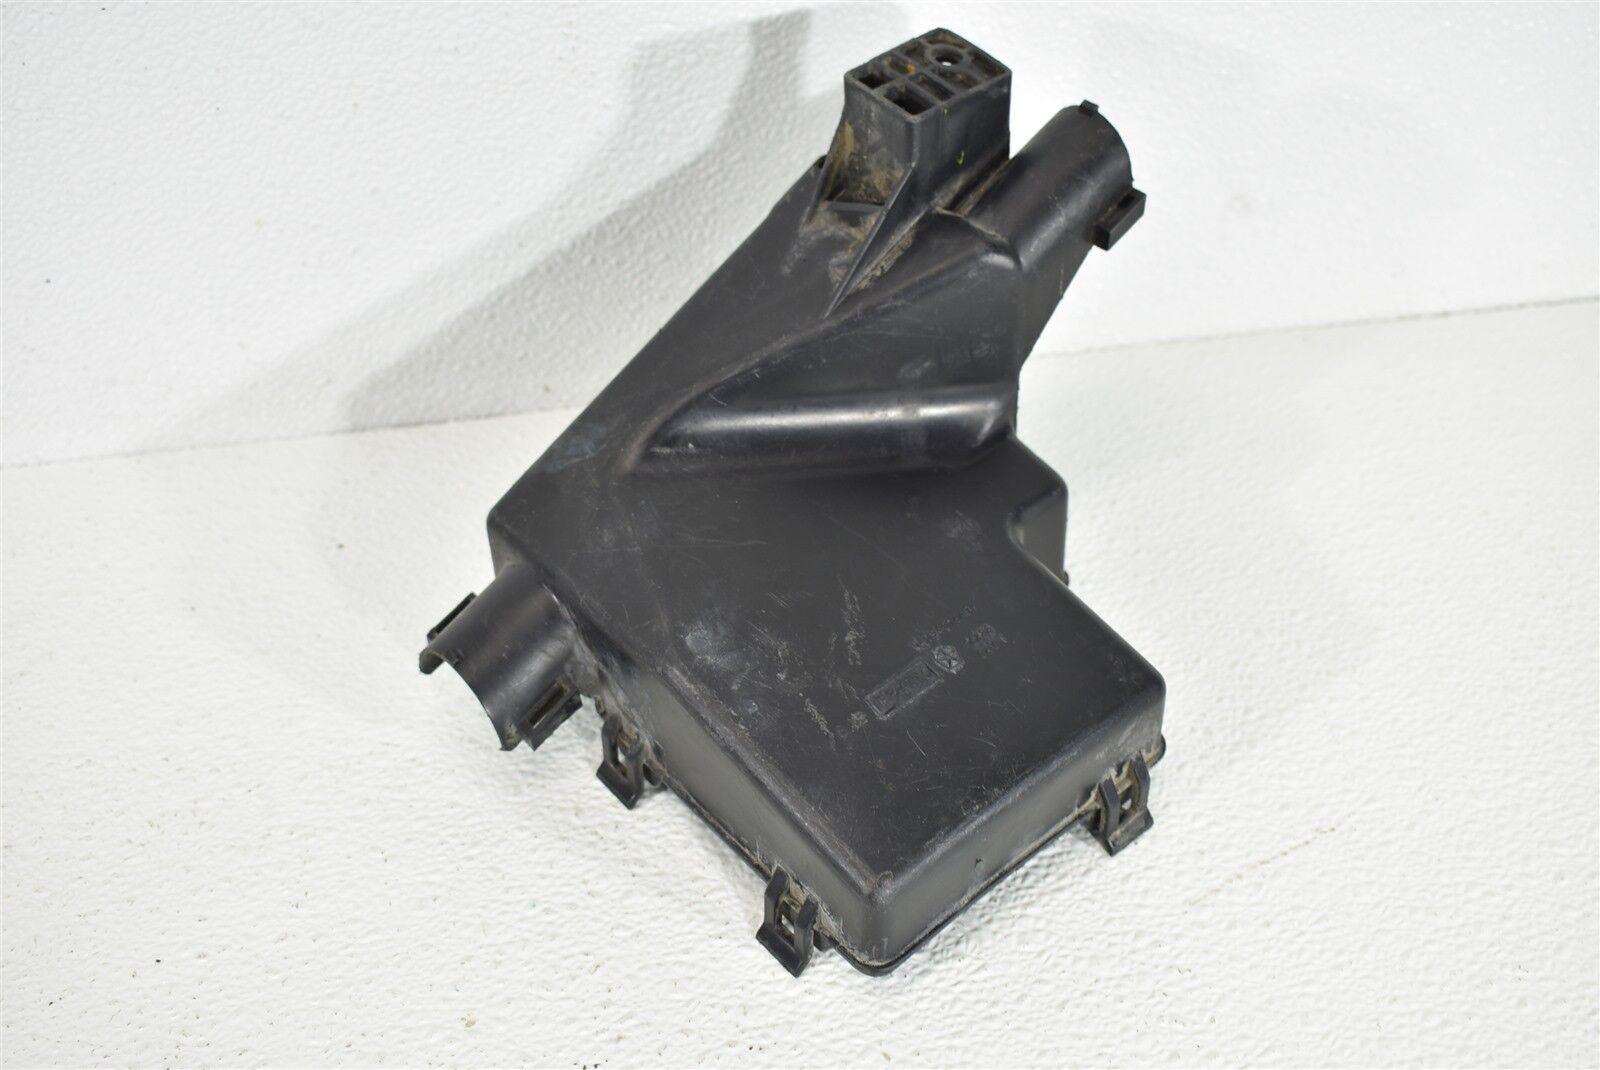 Details about 2003-2005 Dodge Neon SRT4 Engine Fuse Box Trim Cover on